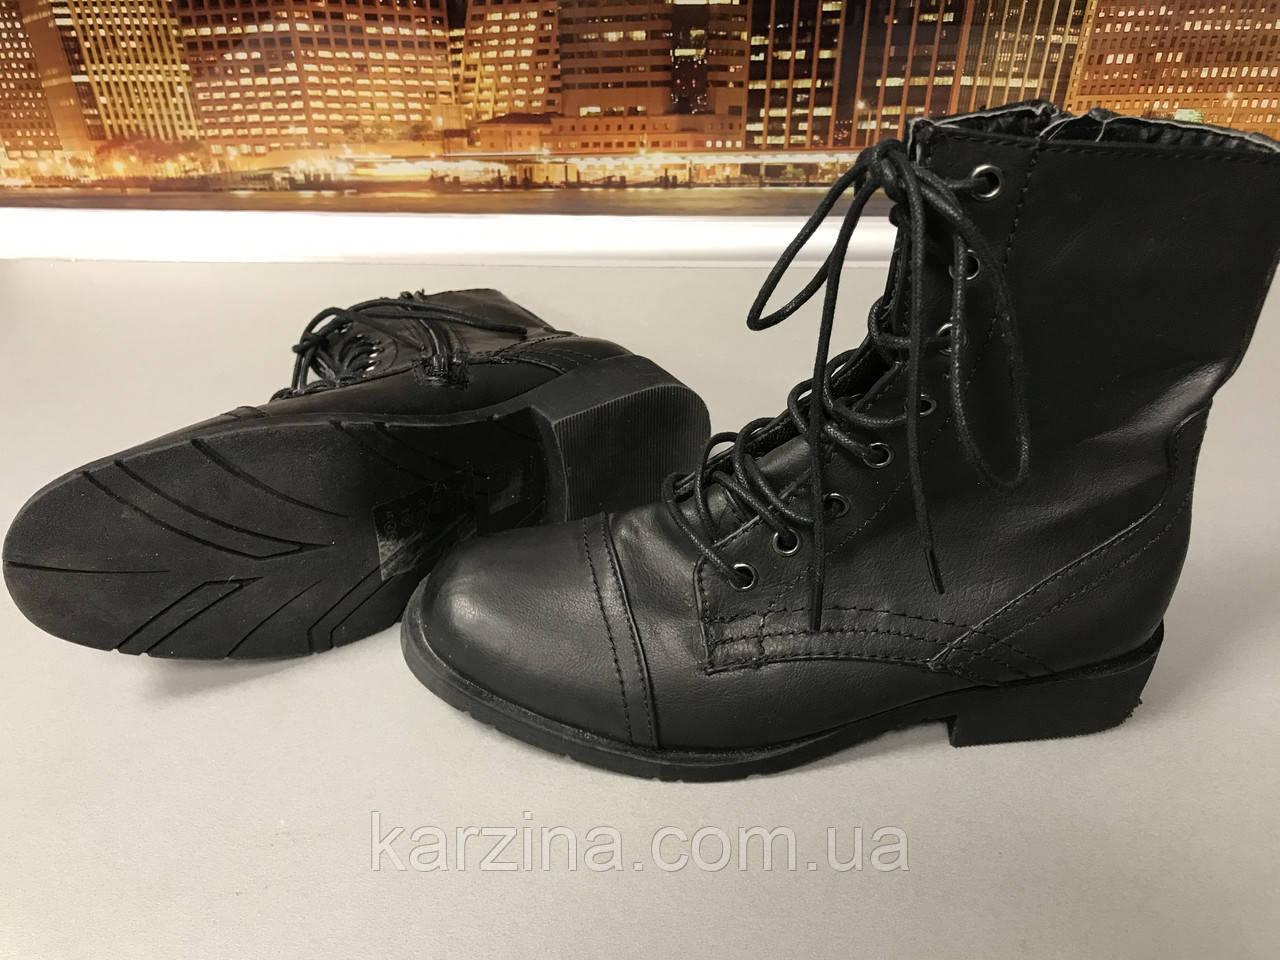 Ботинки La redoute р37